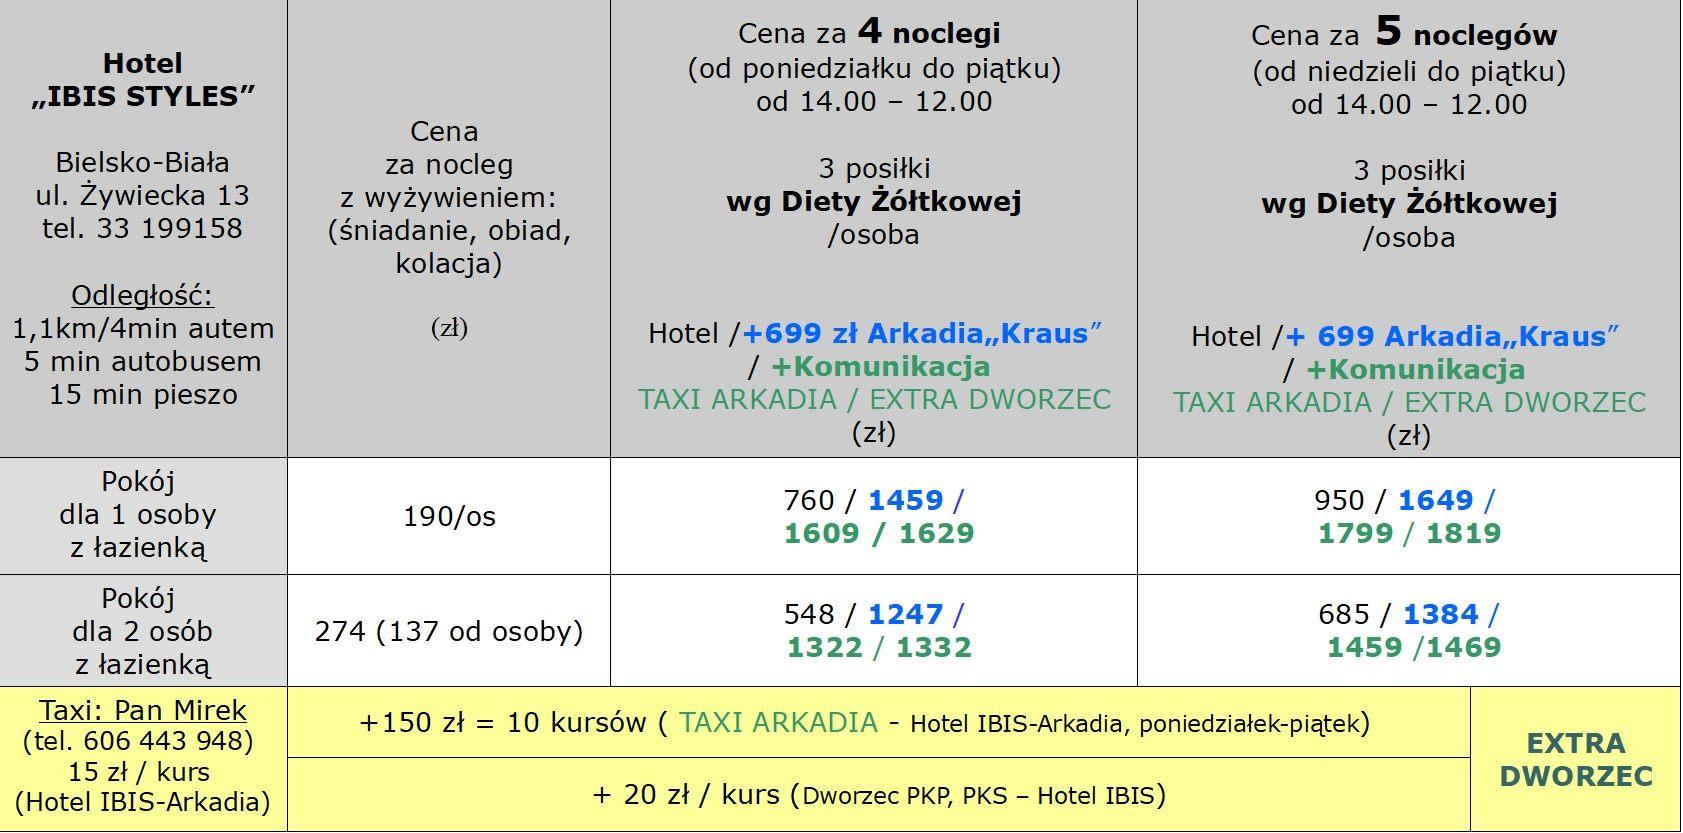 https://www.arkadiakraus.com/wp-content/uploads/2020/07/Ceny-Hotel-IBIS-Arkadia-Kraus-05.2020.jpg